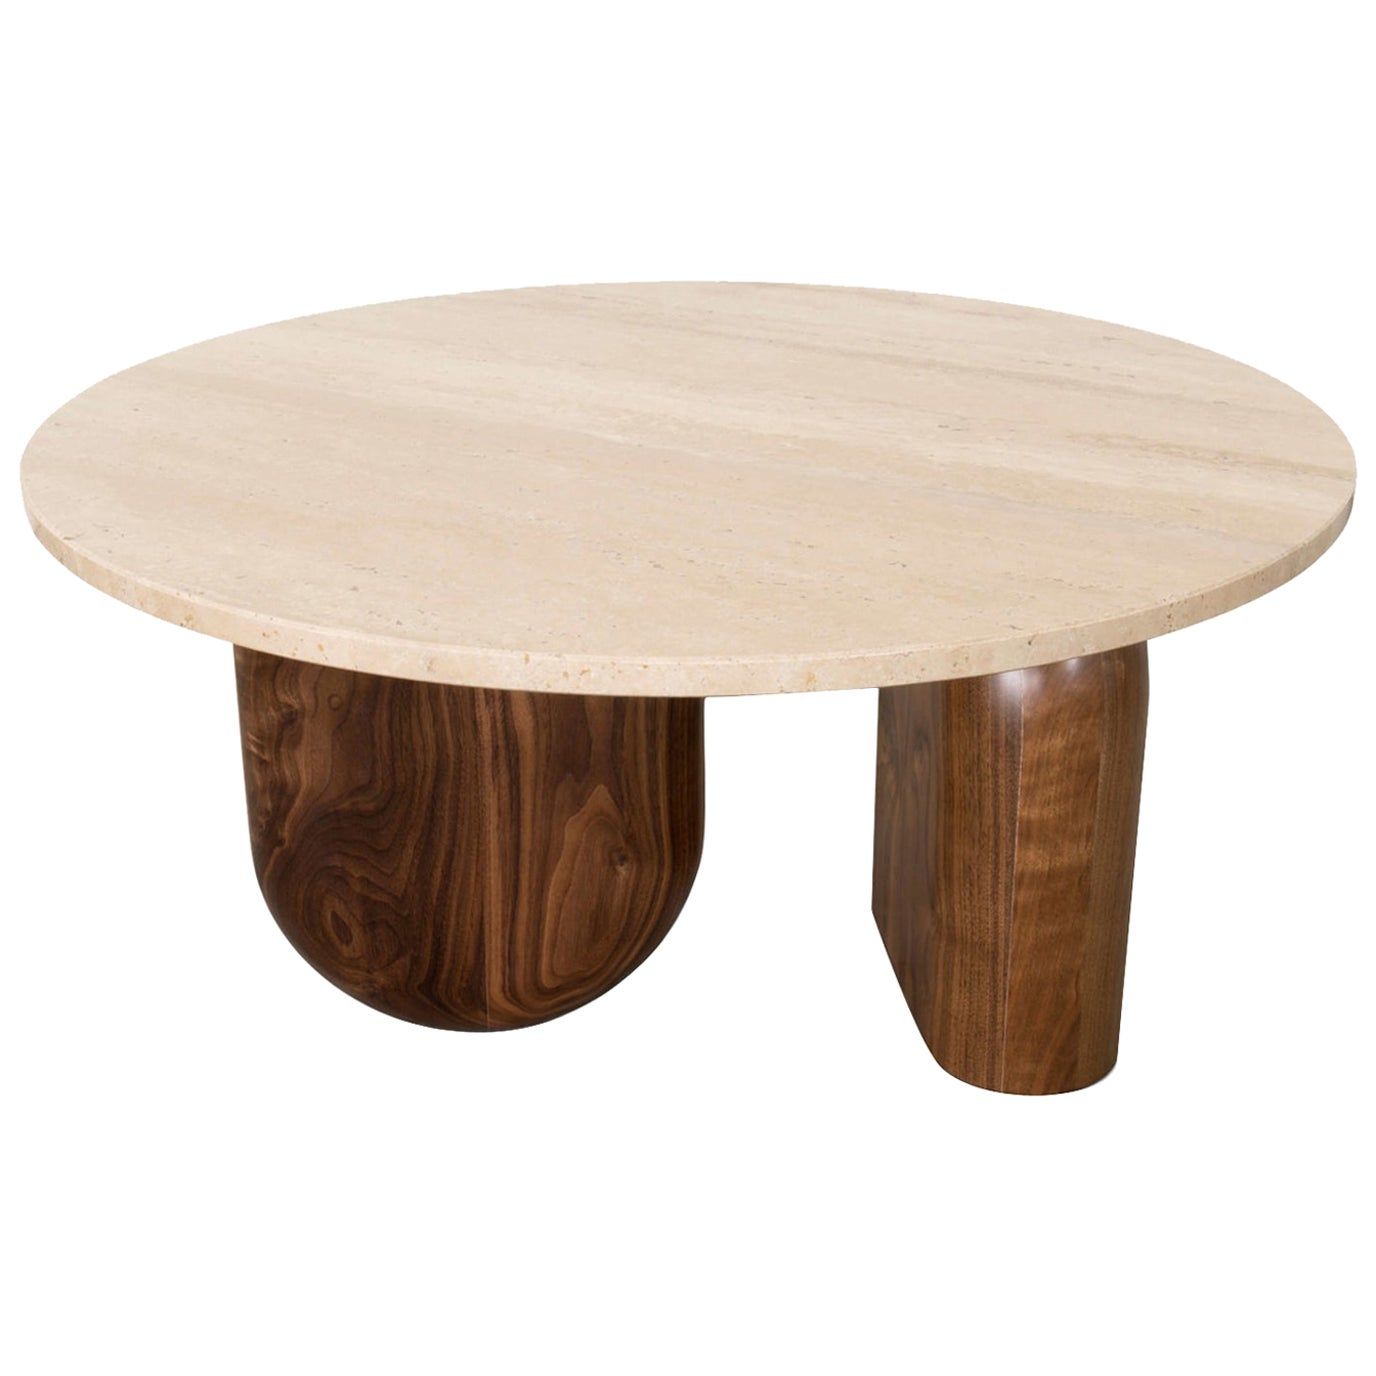 Tessa Round Coffee Table